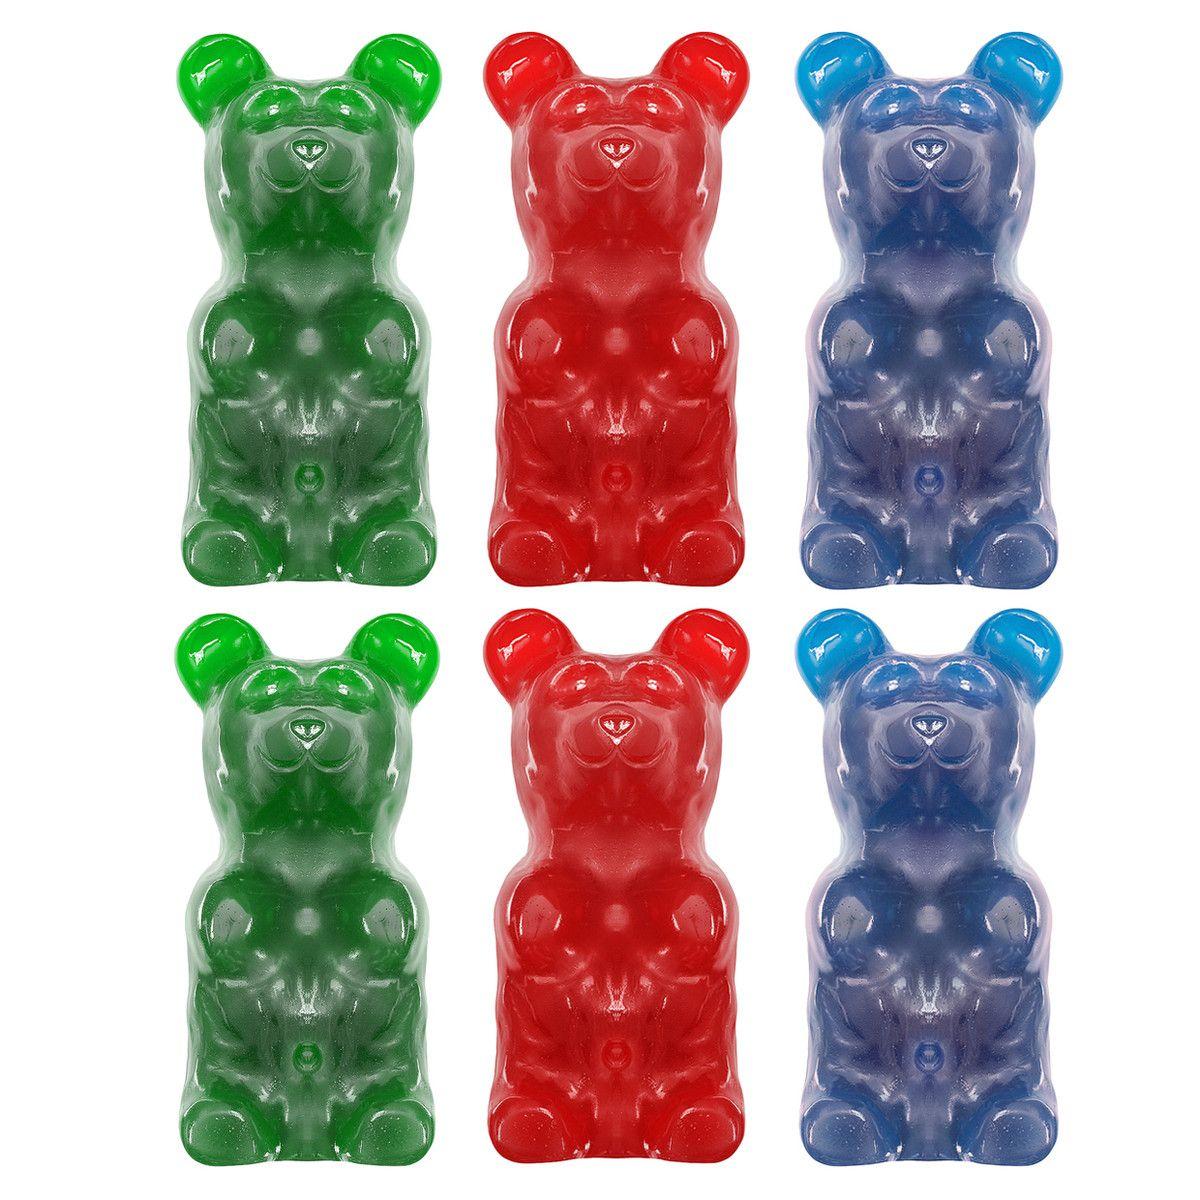 Endless Supply Of Giant Gummy Bears Gummy Bear 6 Pack Popular Mix By Giant Gummy Bears Gummy Bears Gummies Favorite Candy